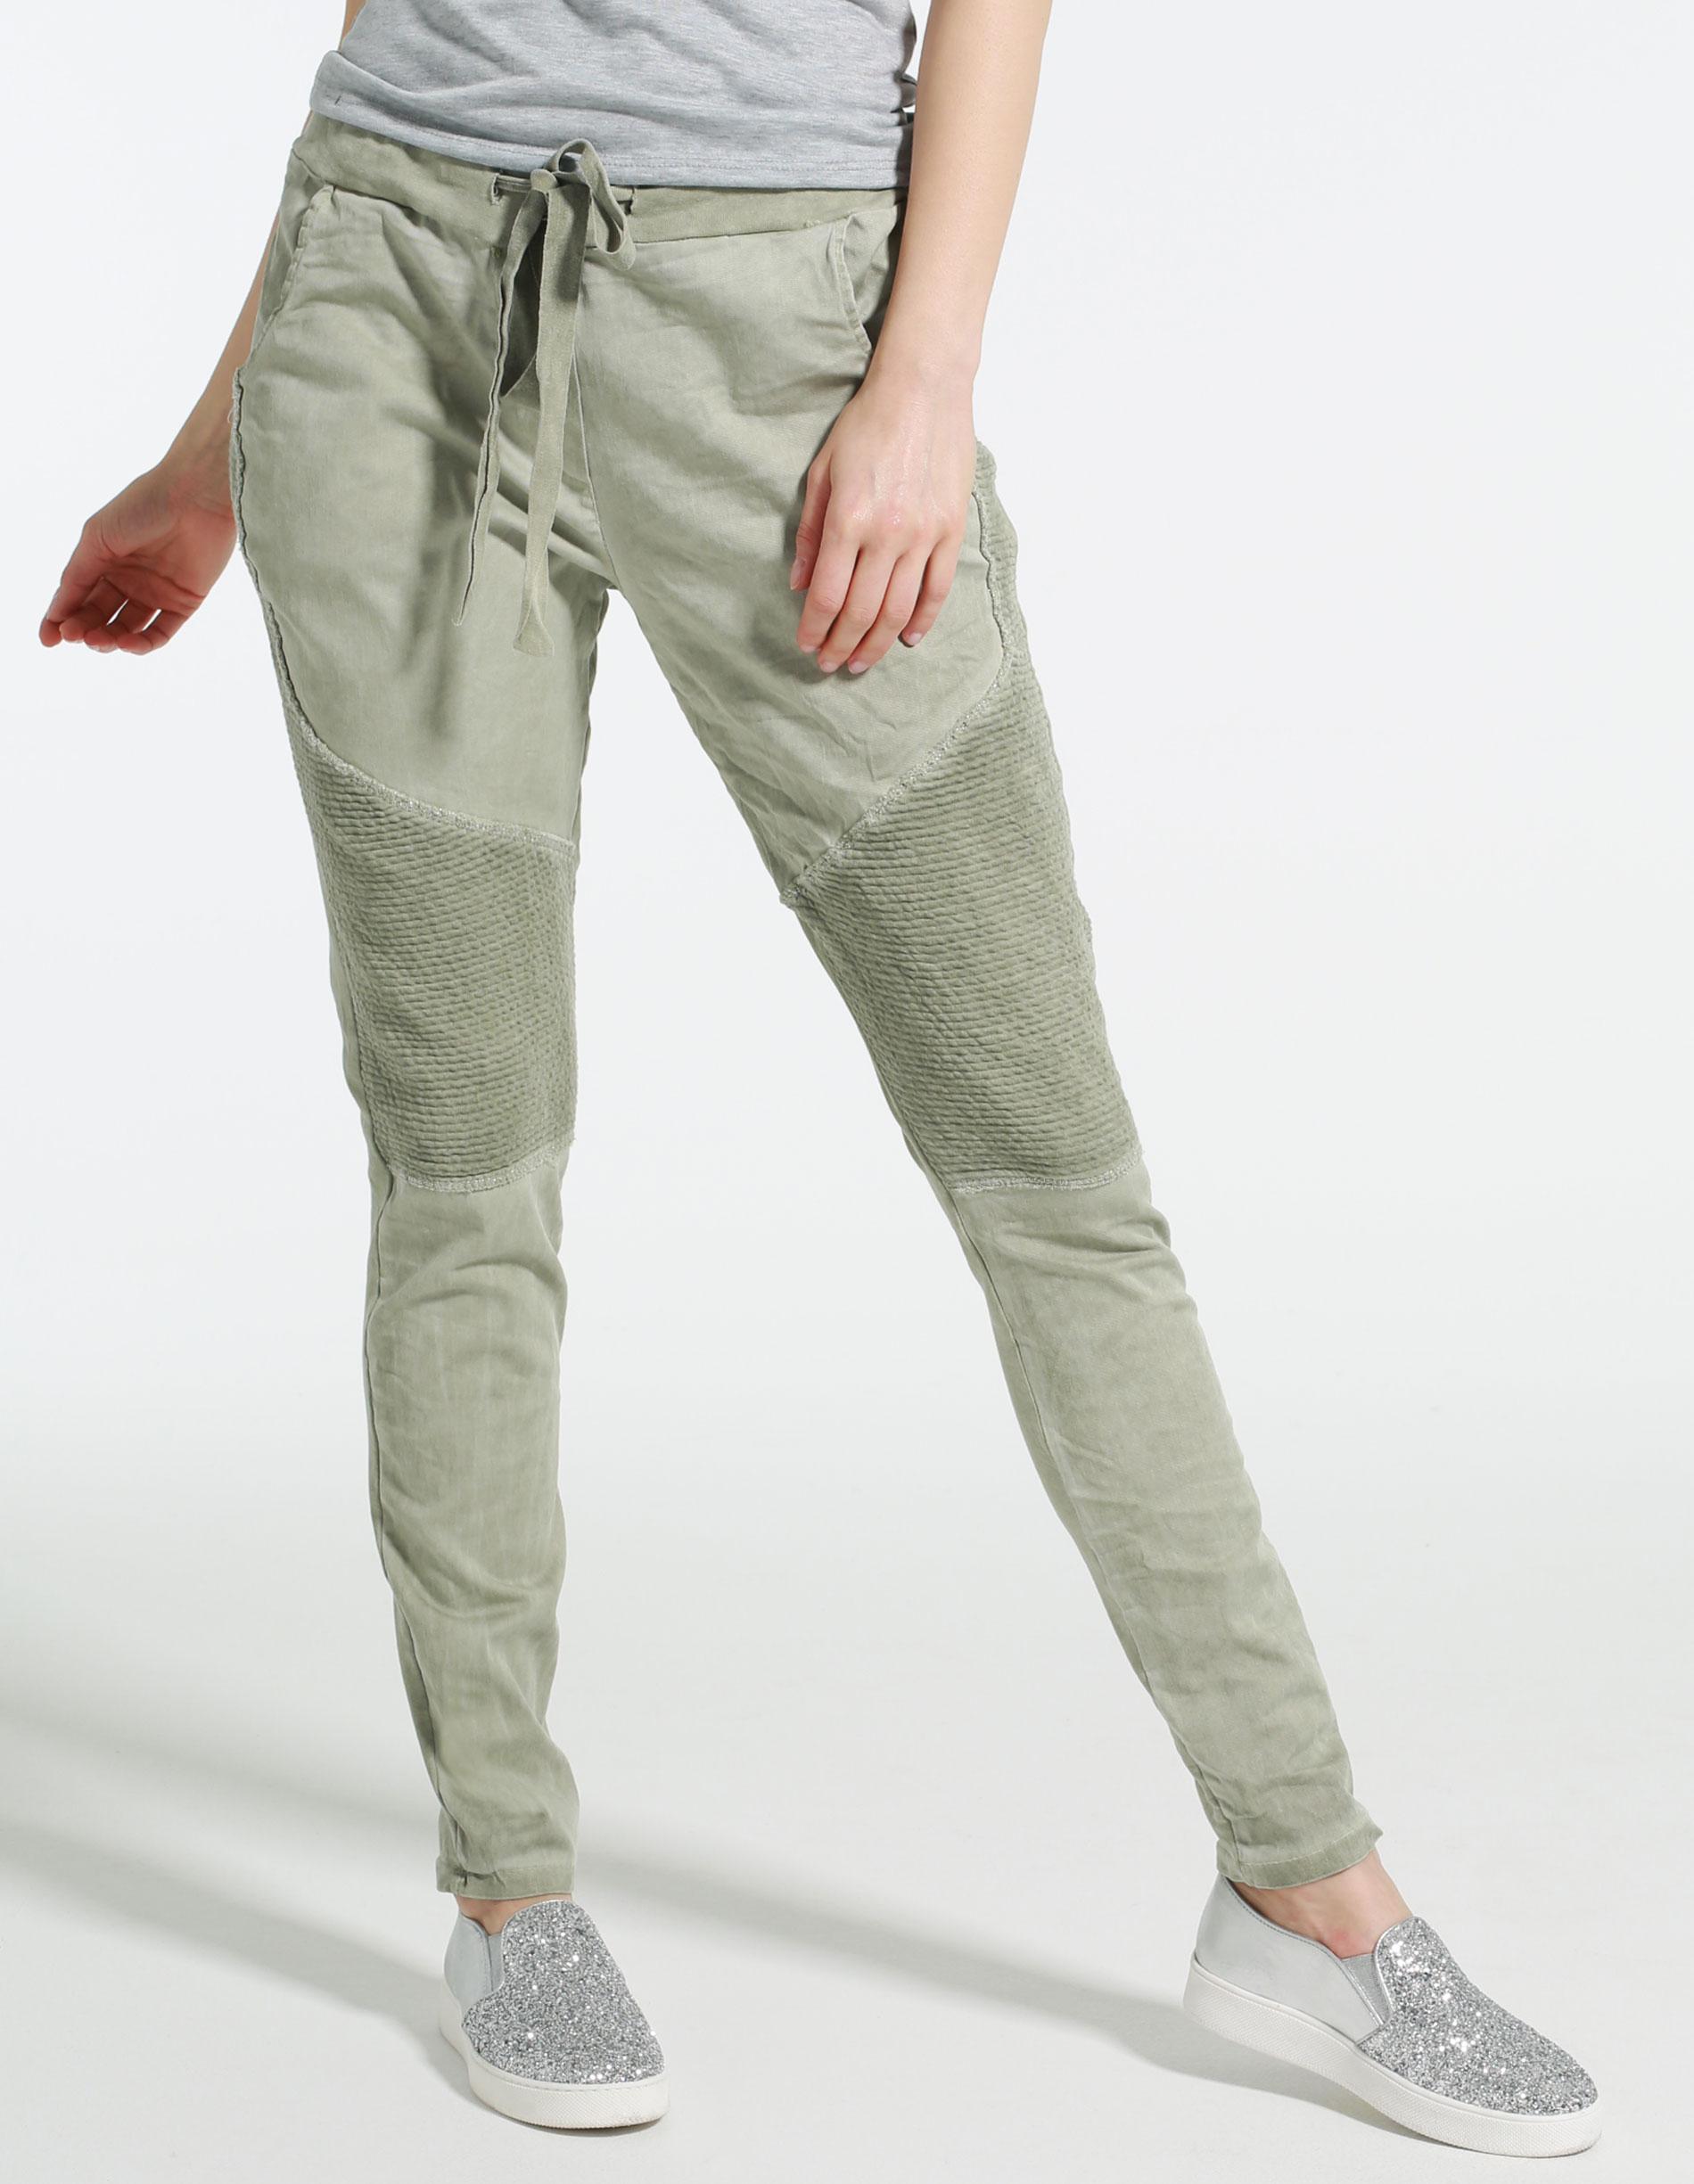 Spodnie - 141-1972 MILI - Unisono